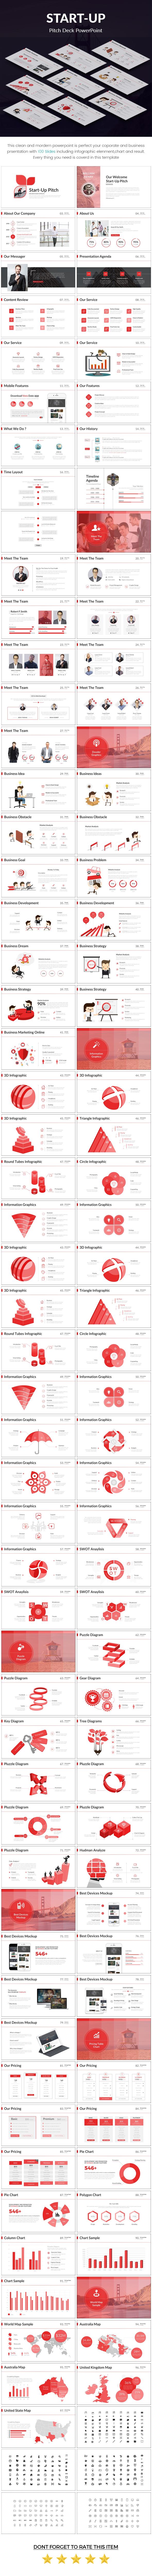 Start-up Pitch Deck - Pitch Deck PowerPoint Templates